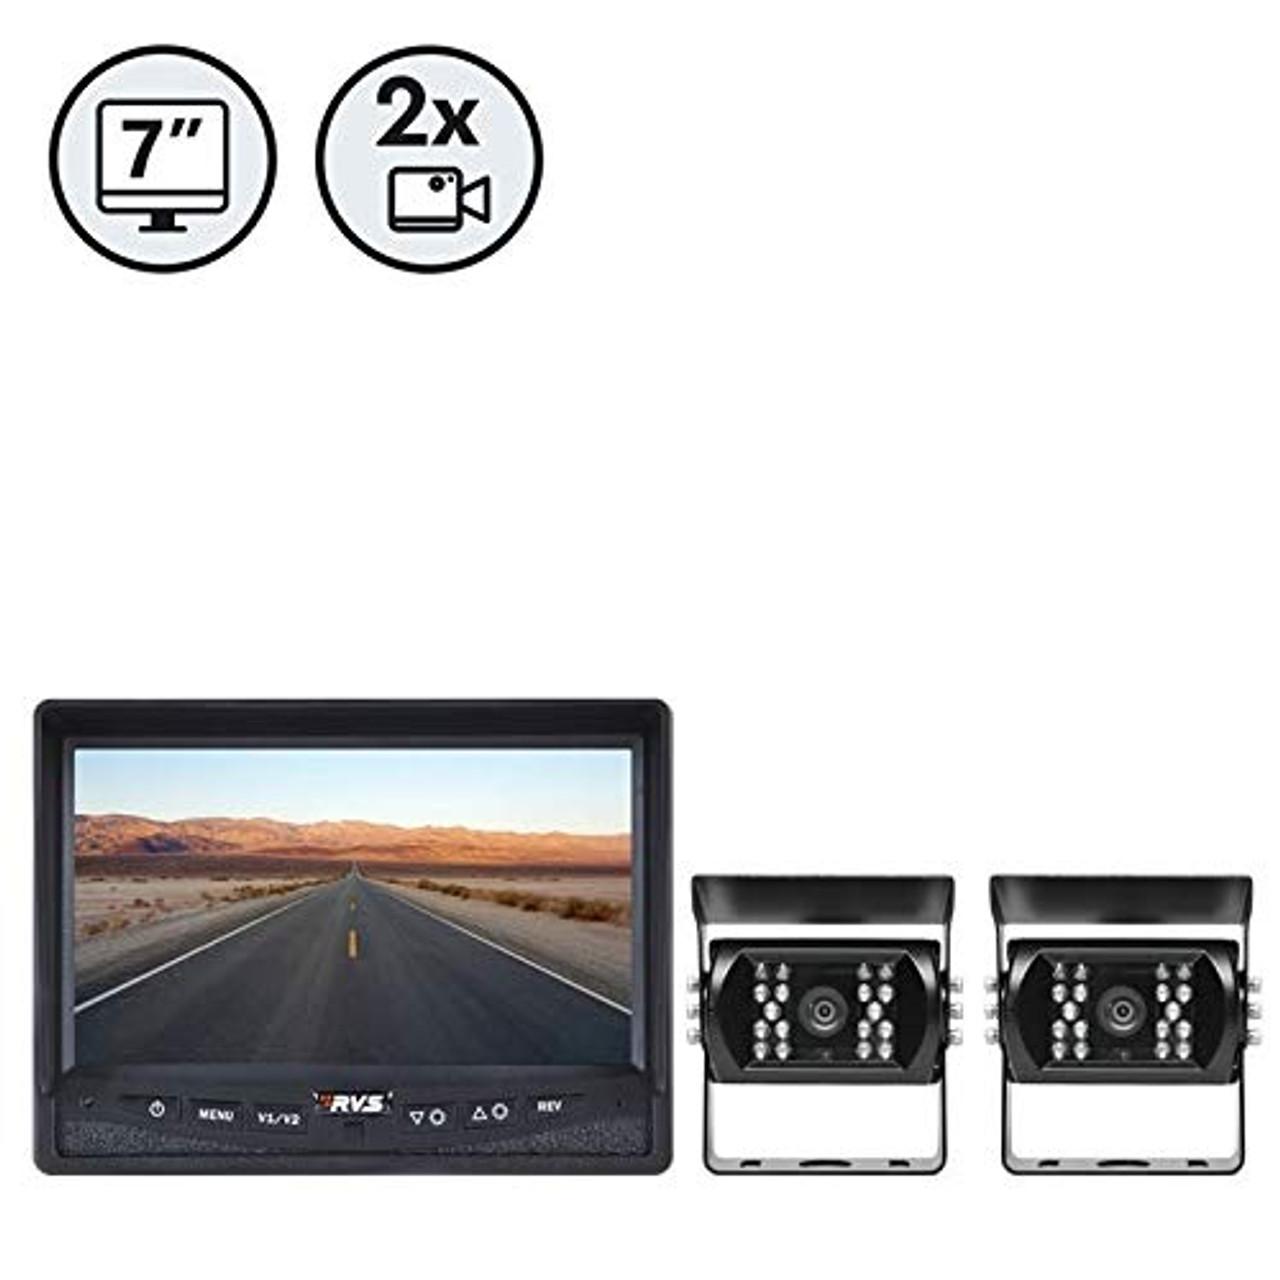 "7"" Display, 2 x Backup Cameras, 2 x 66' Cables | 1016VYM4Z01"